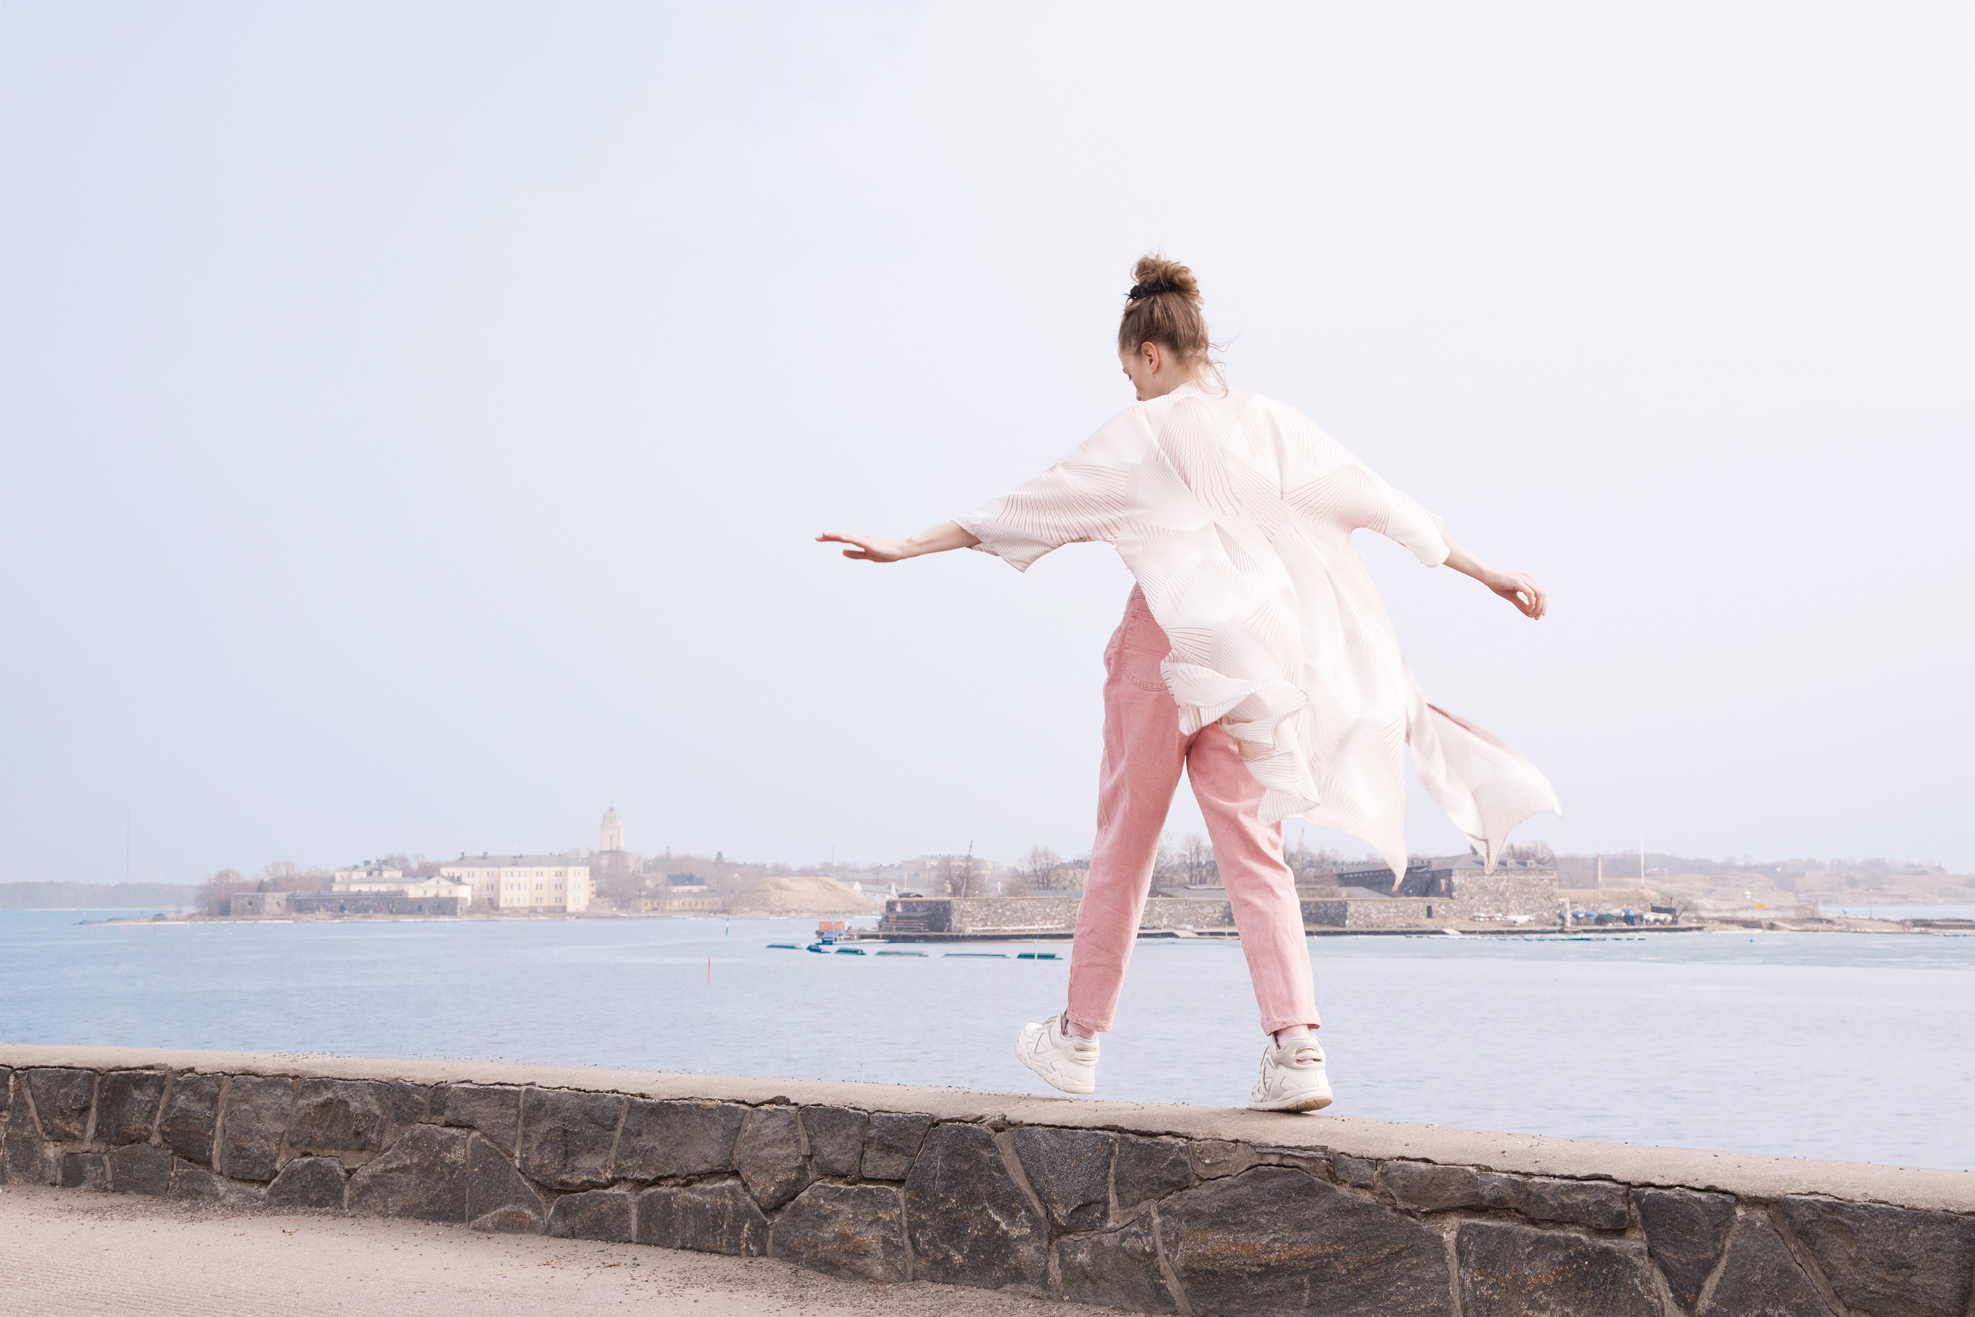 Personal project - Hanami